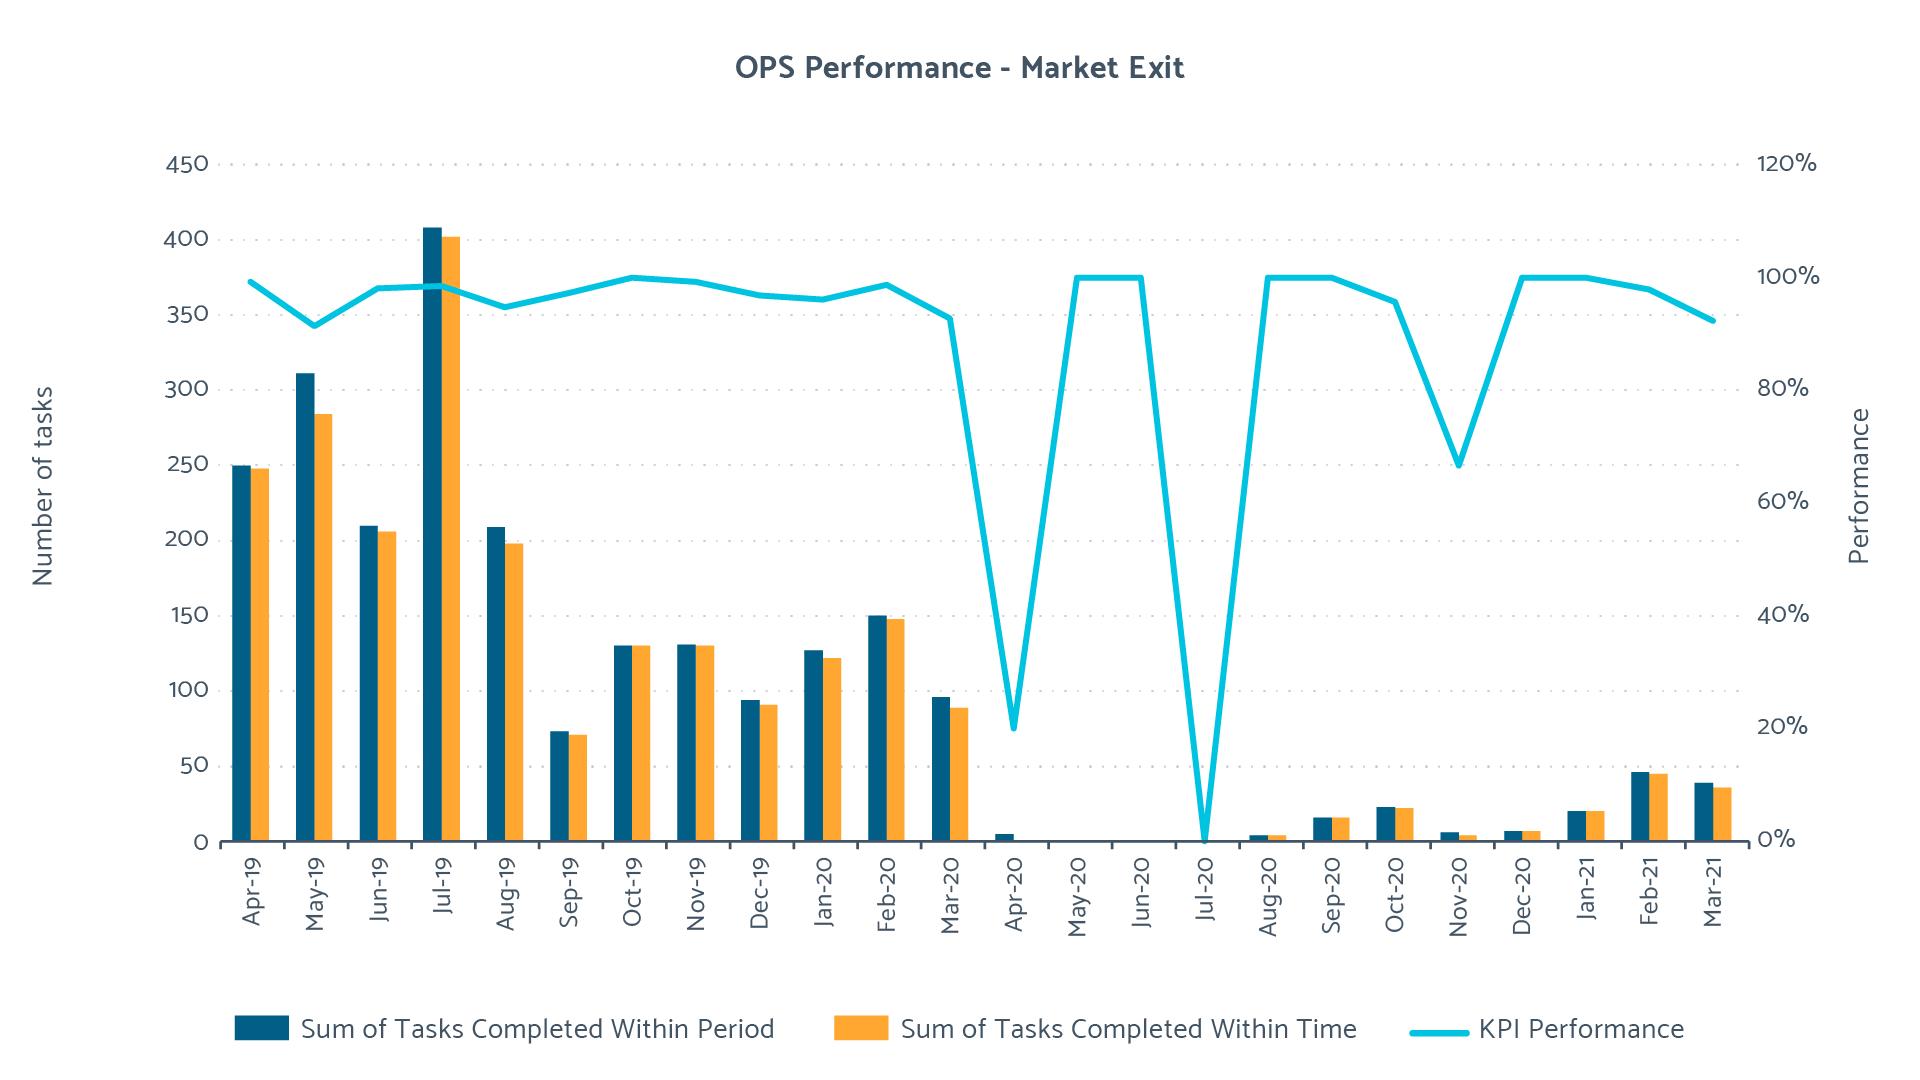 2020/21 Market Exit Performance